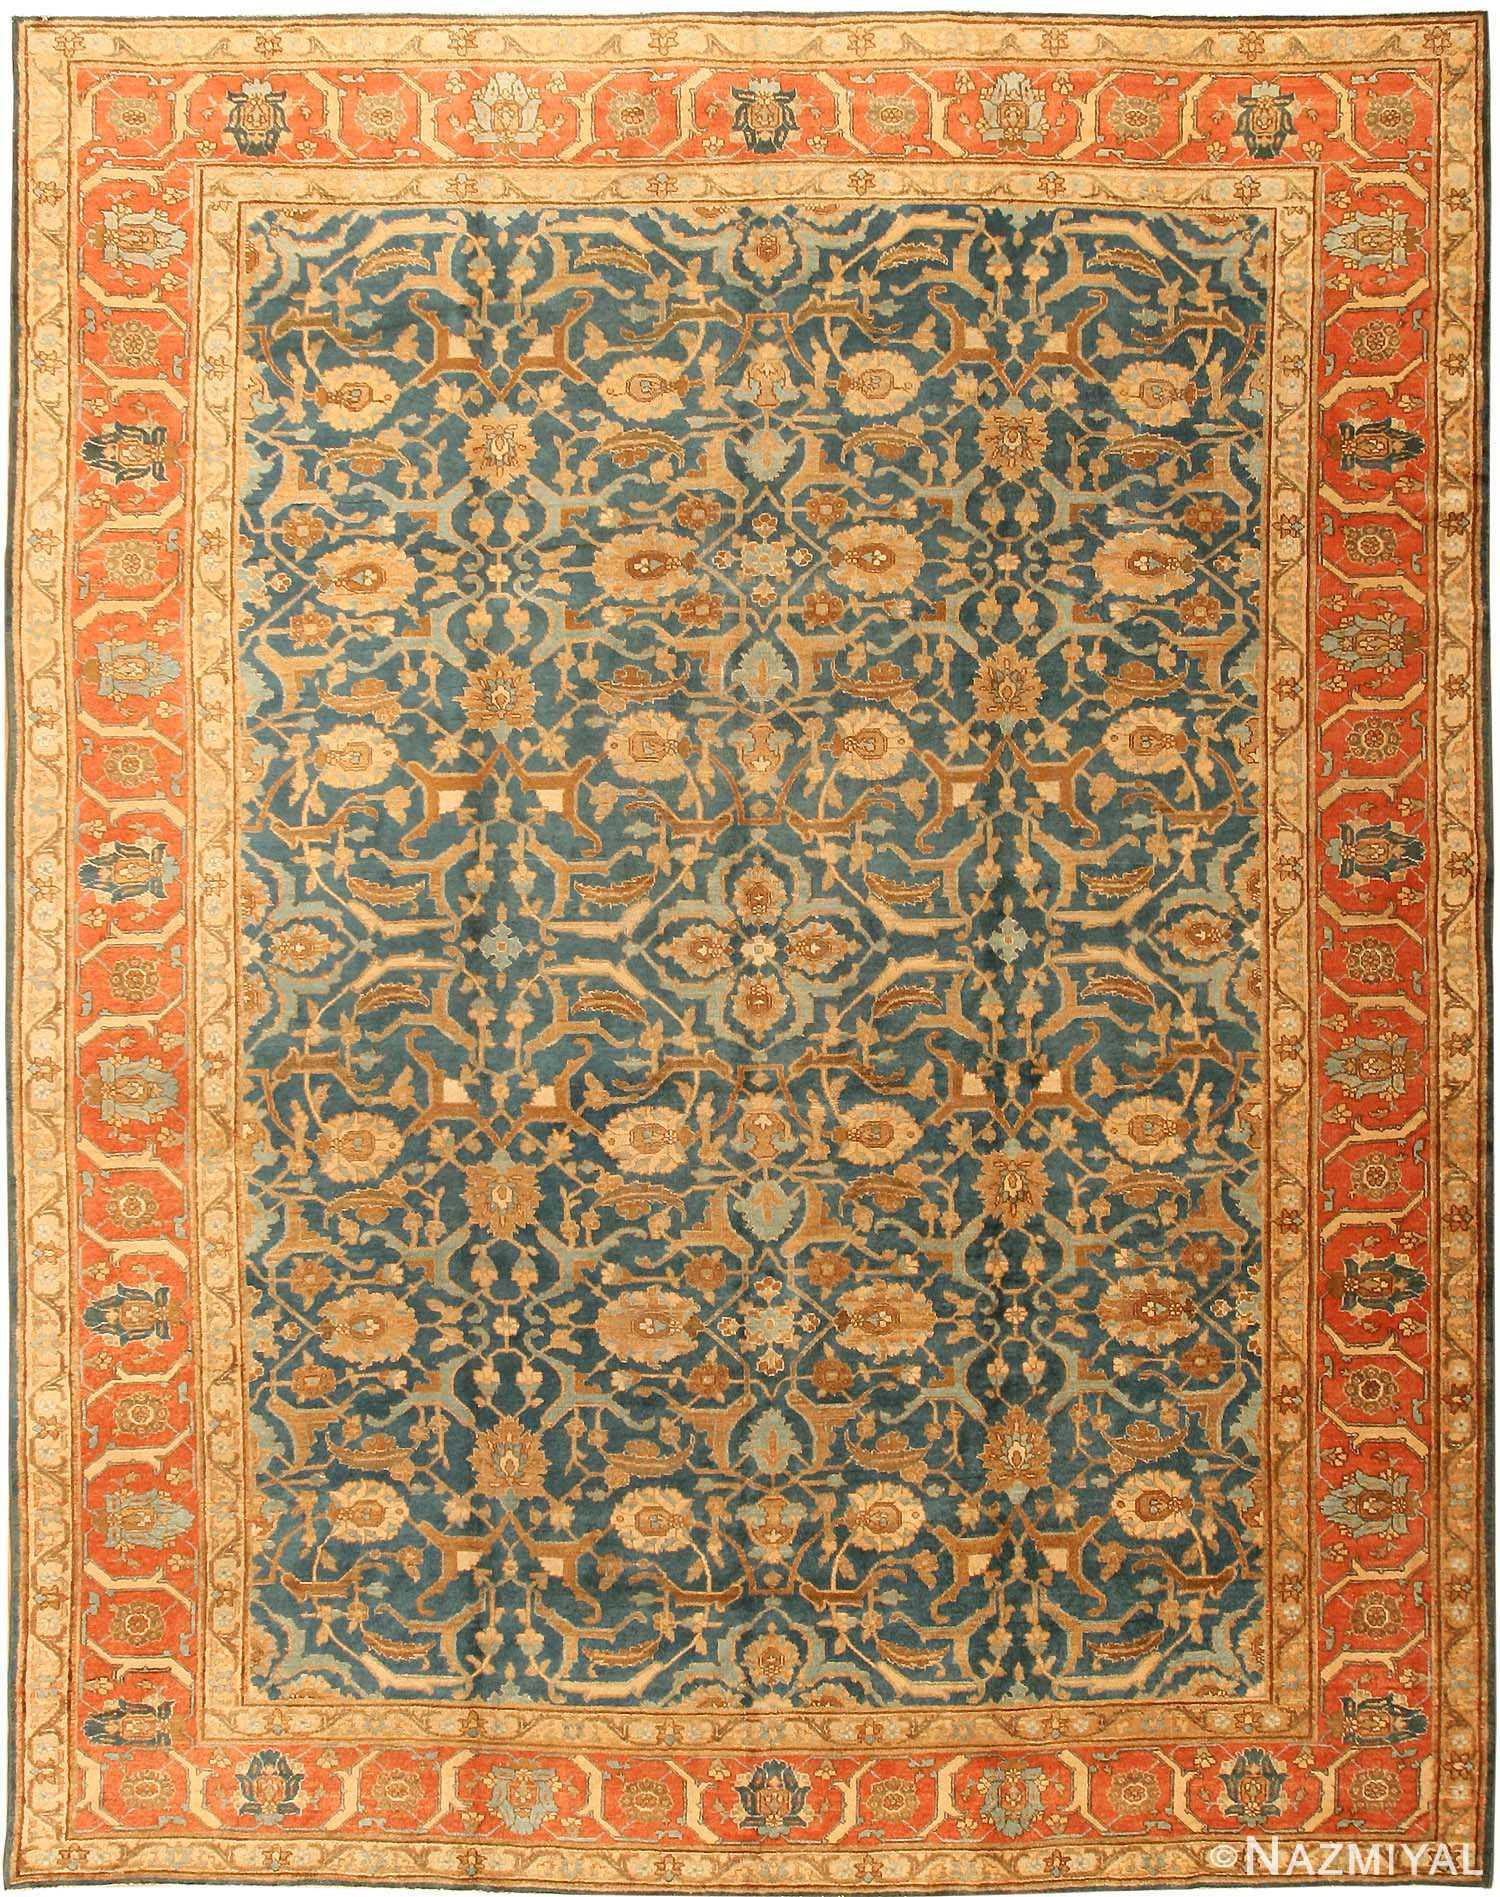 Tabriz Rug Antique Persian Carpet 41622 By Nazmiyal